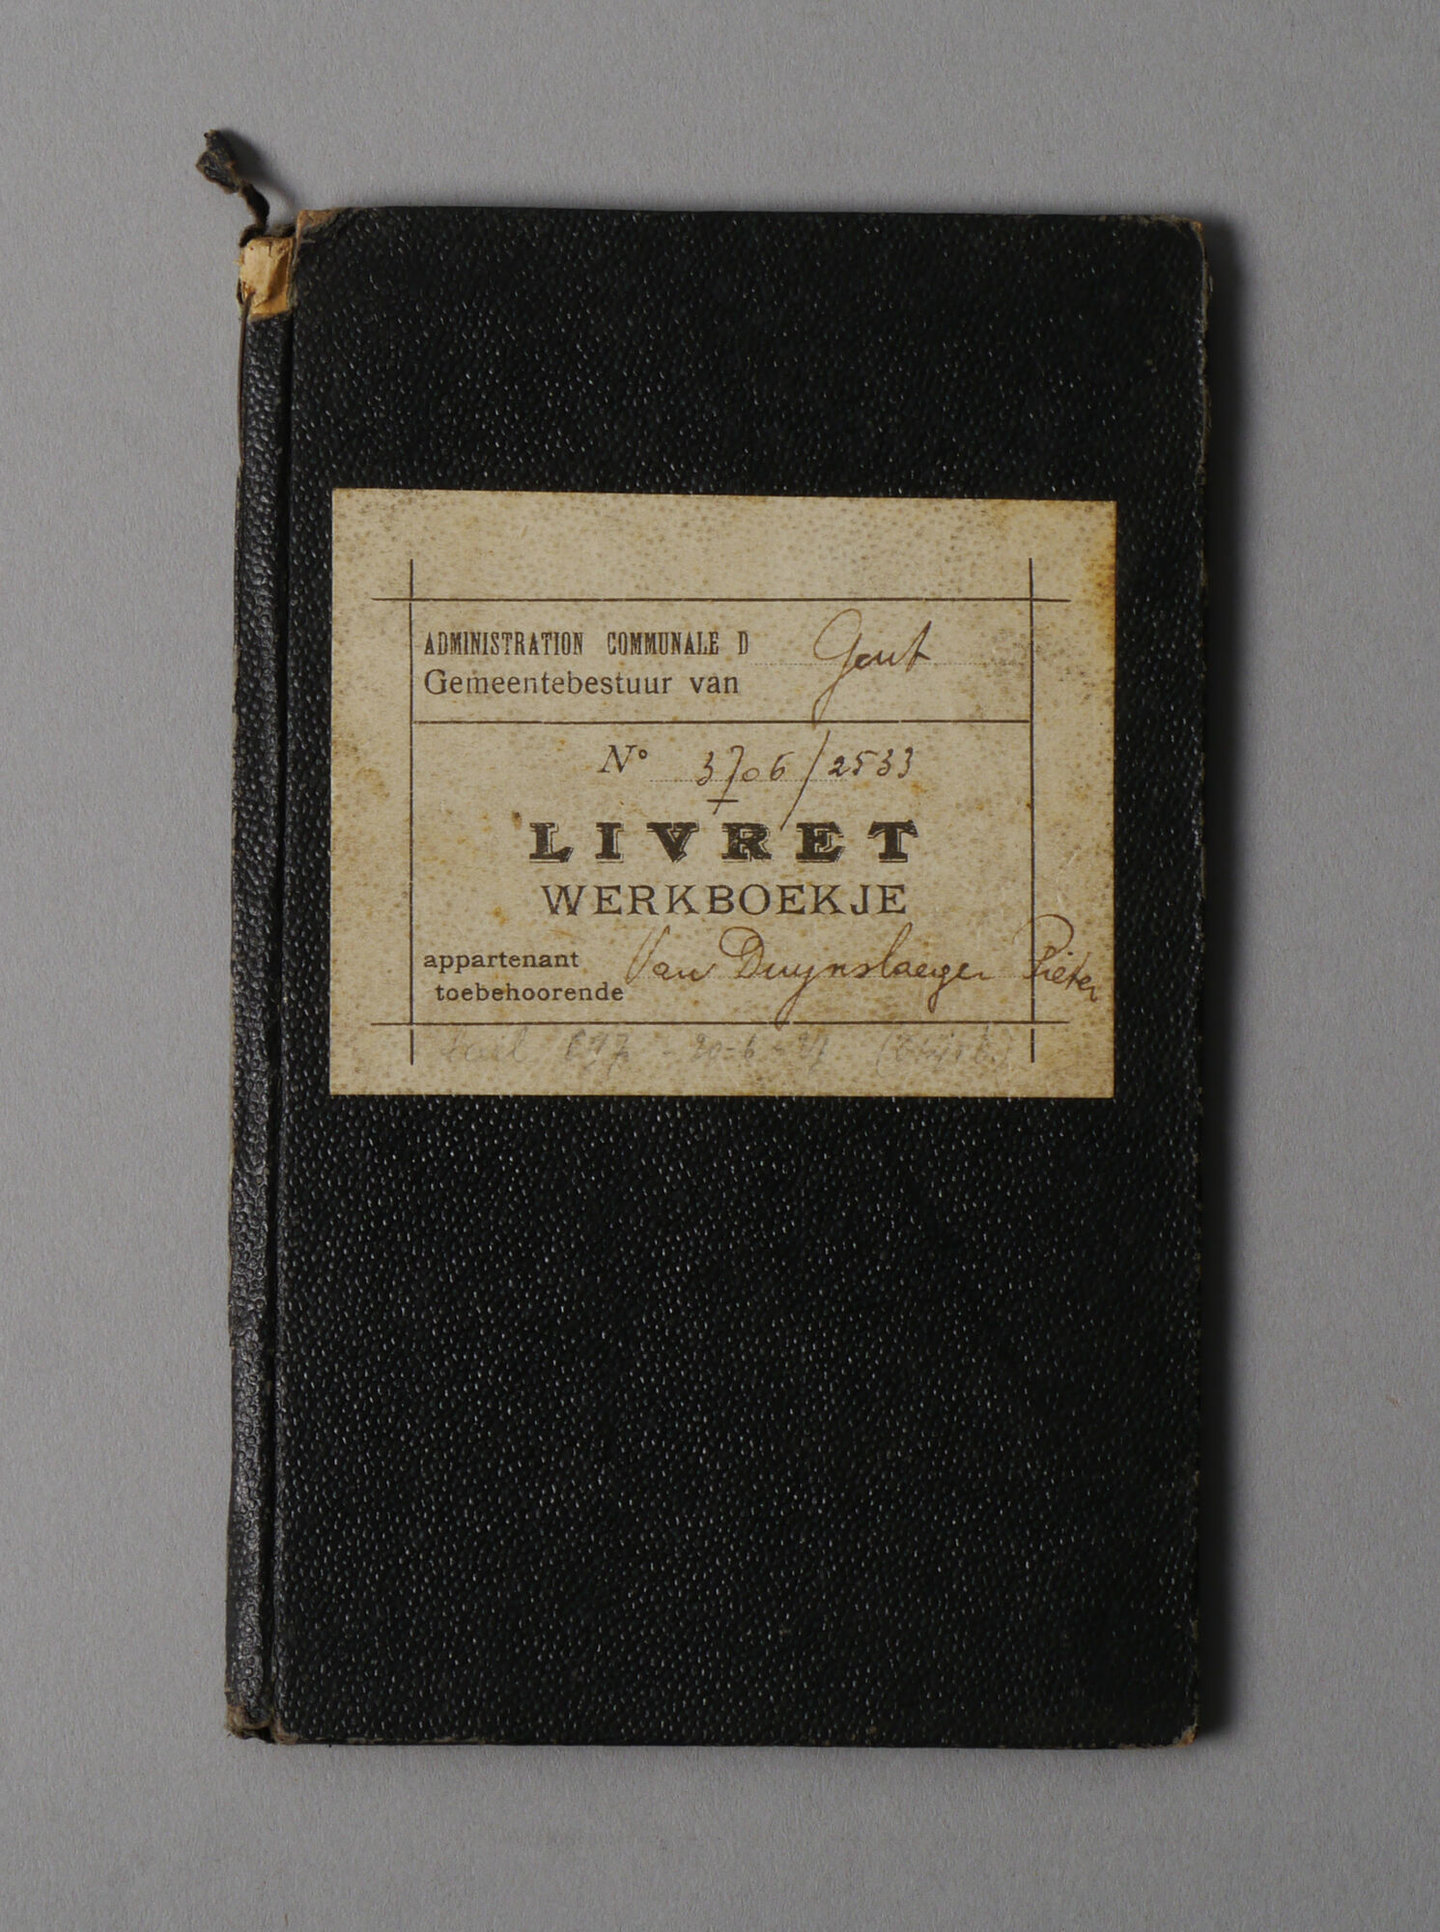 Werkboekje van Pieter Van Duynslaeger